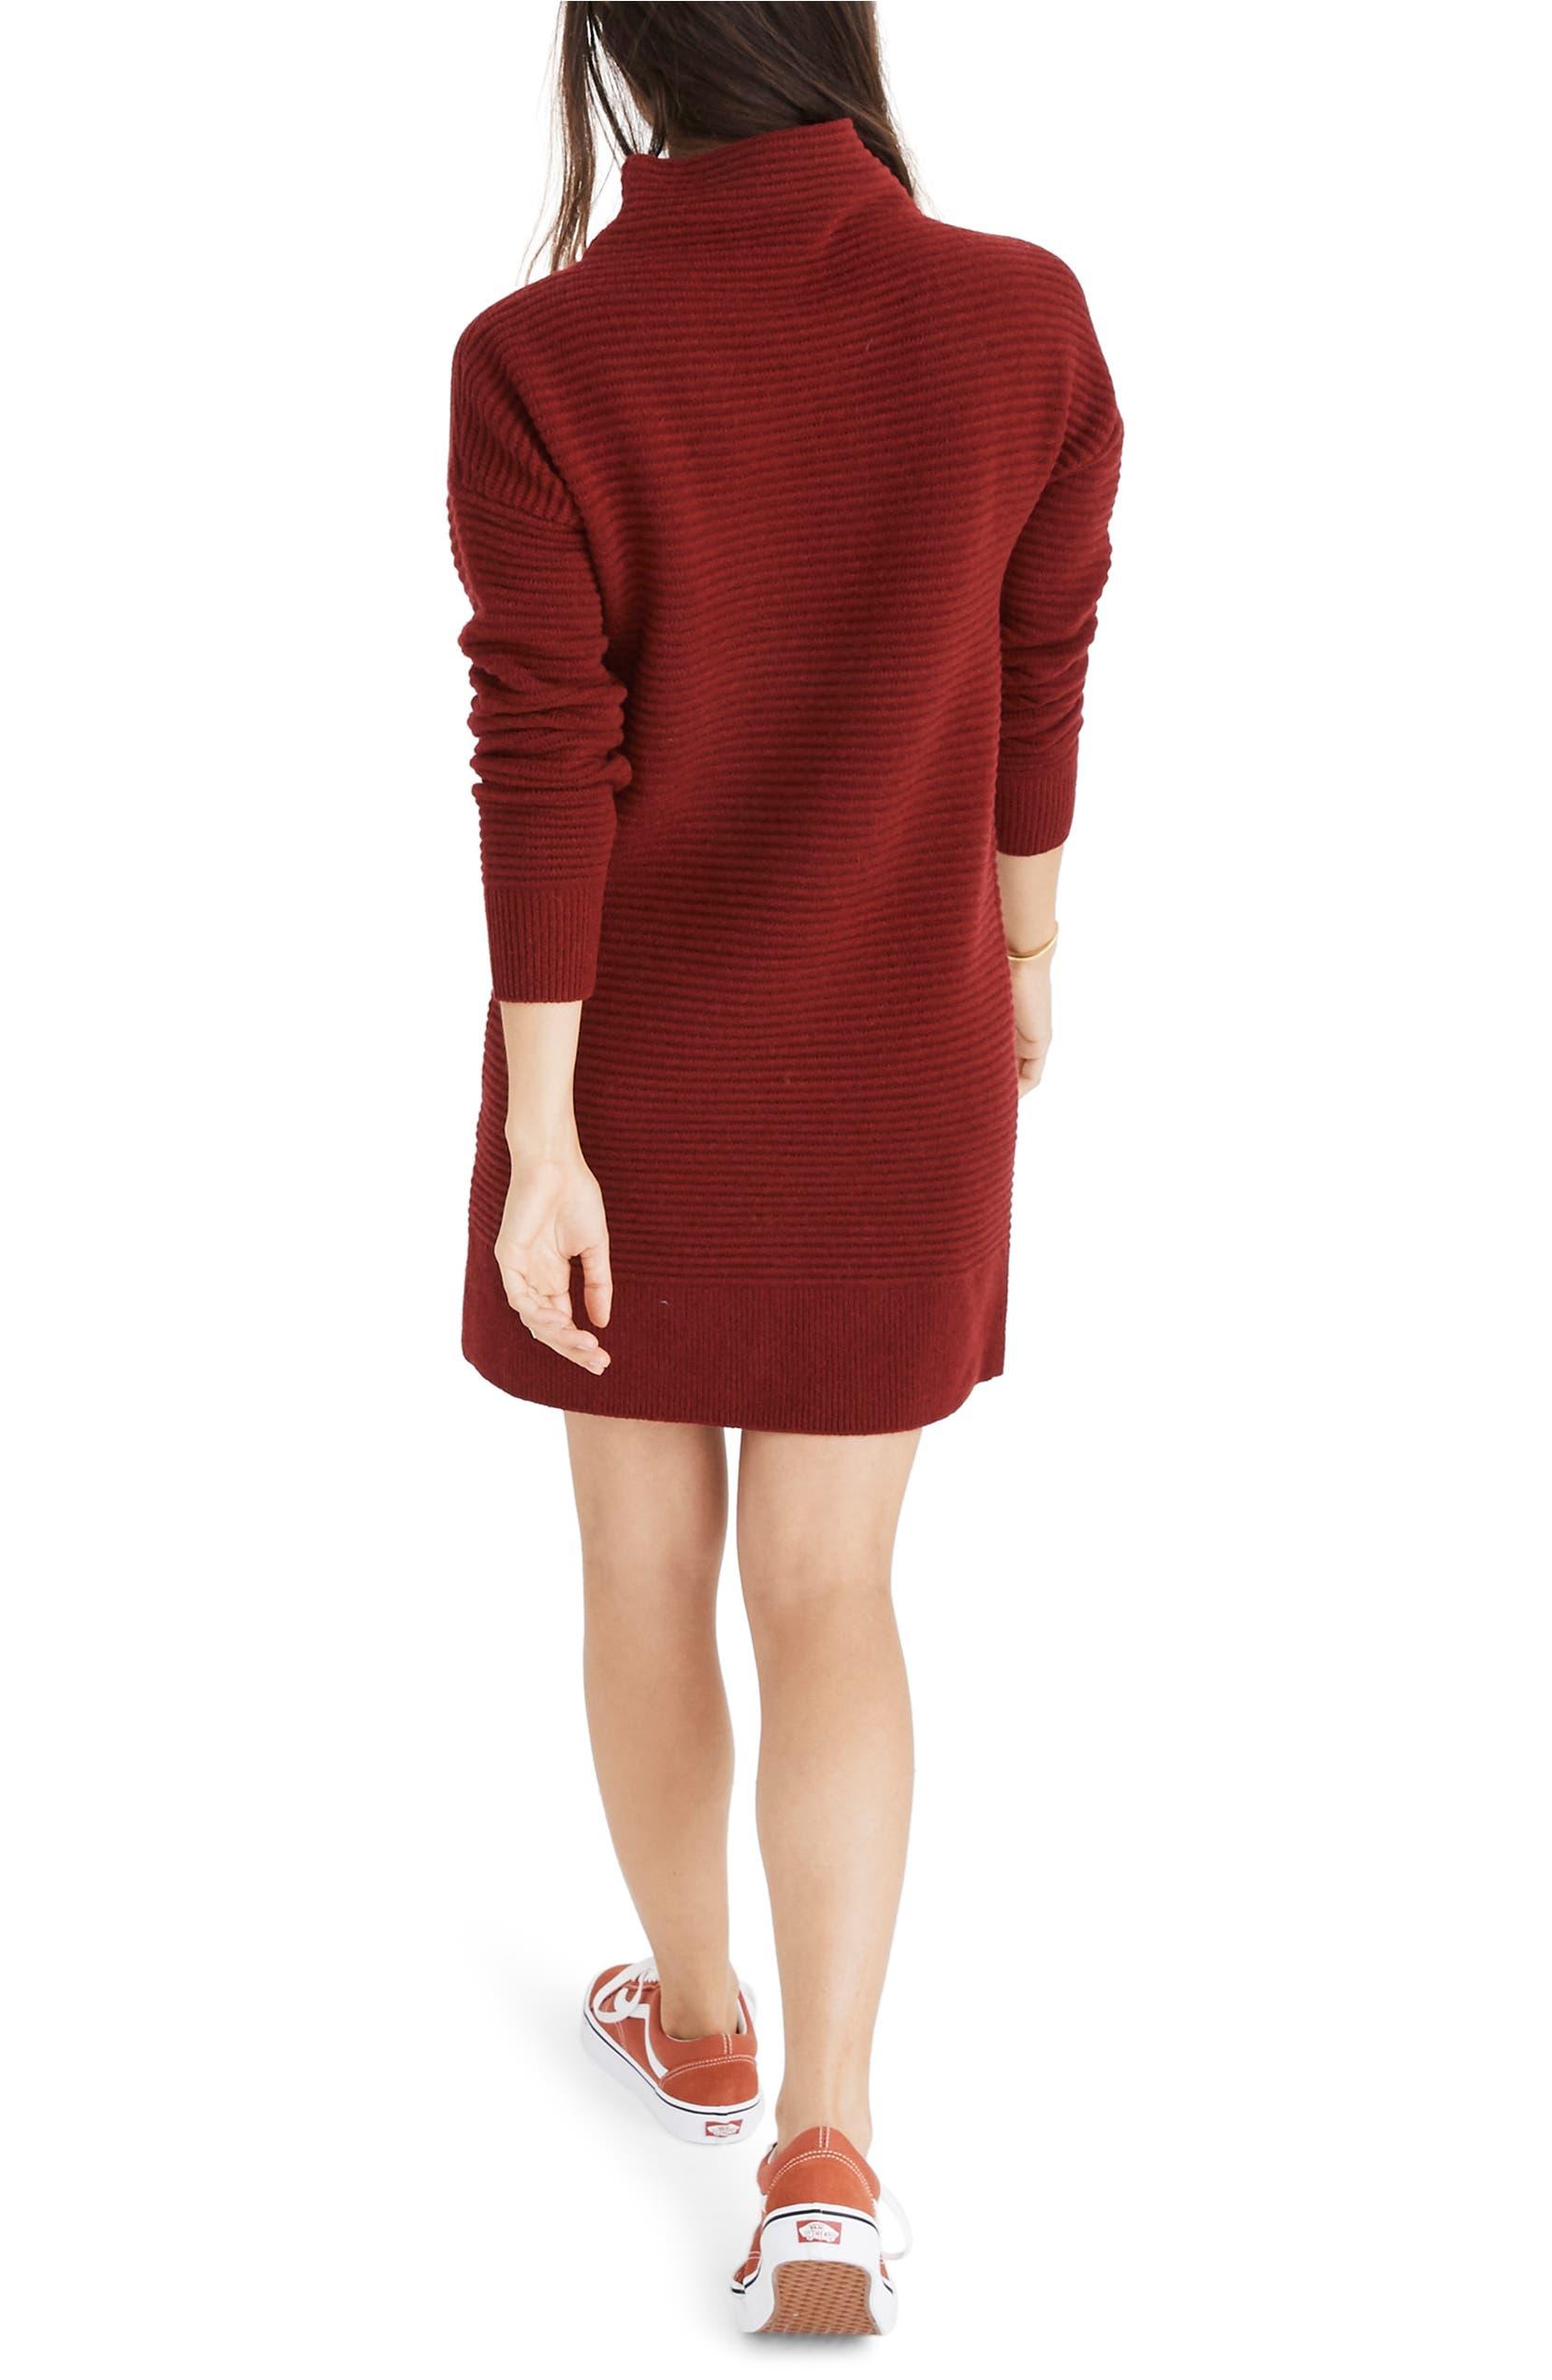 fdcc8a8769 Madewell Skyscraper Merino Wool Sweater Dress